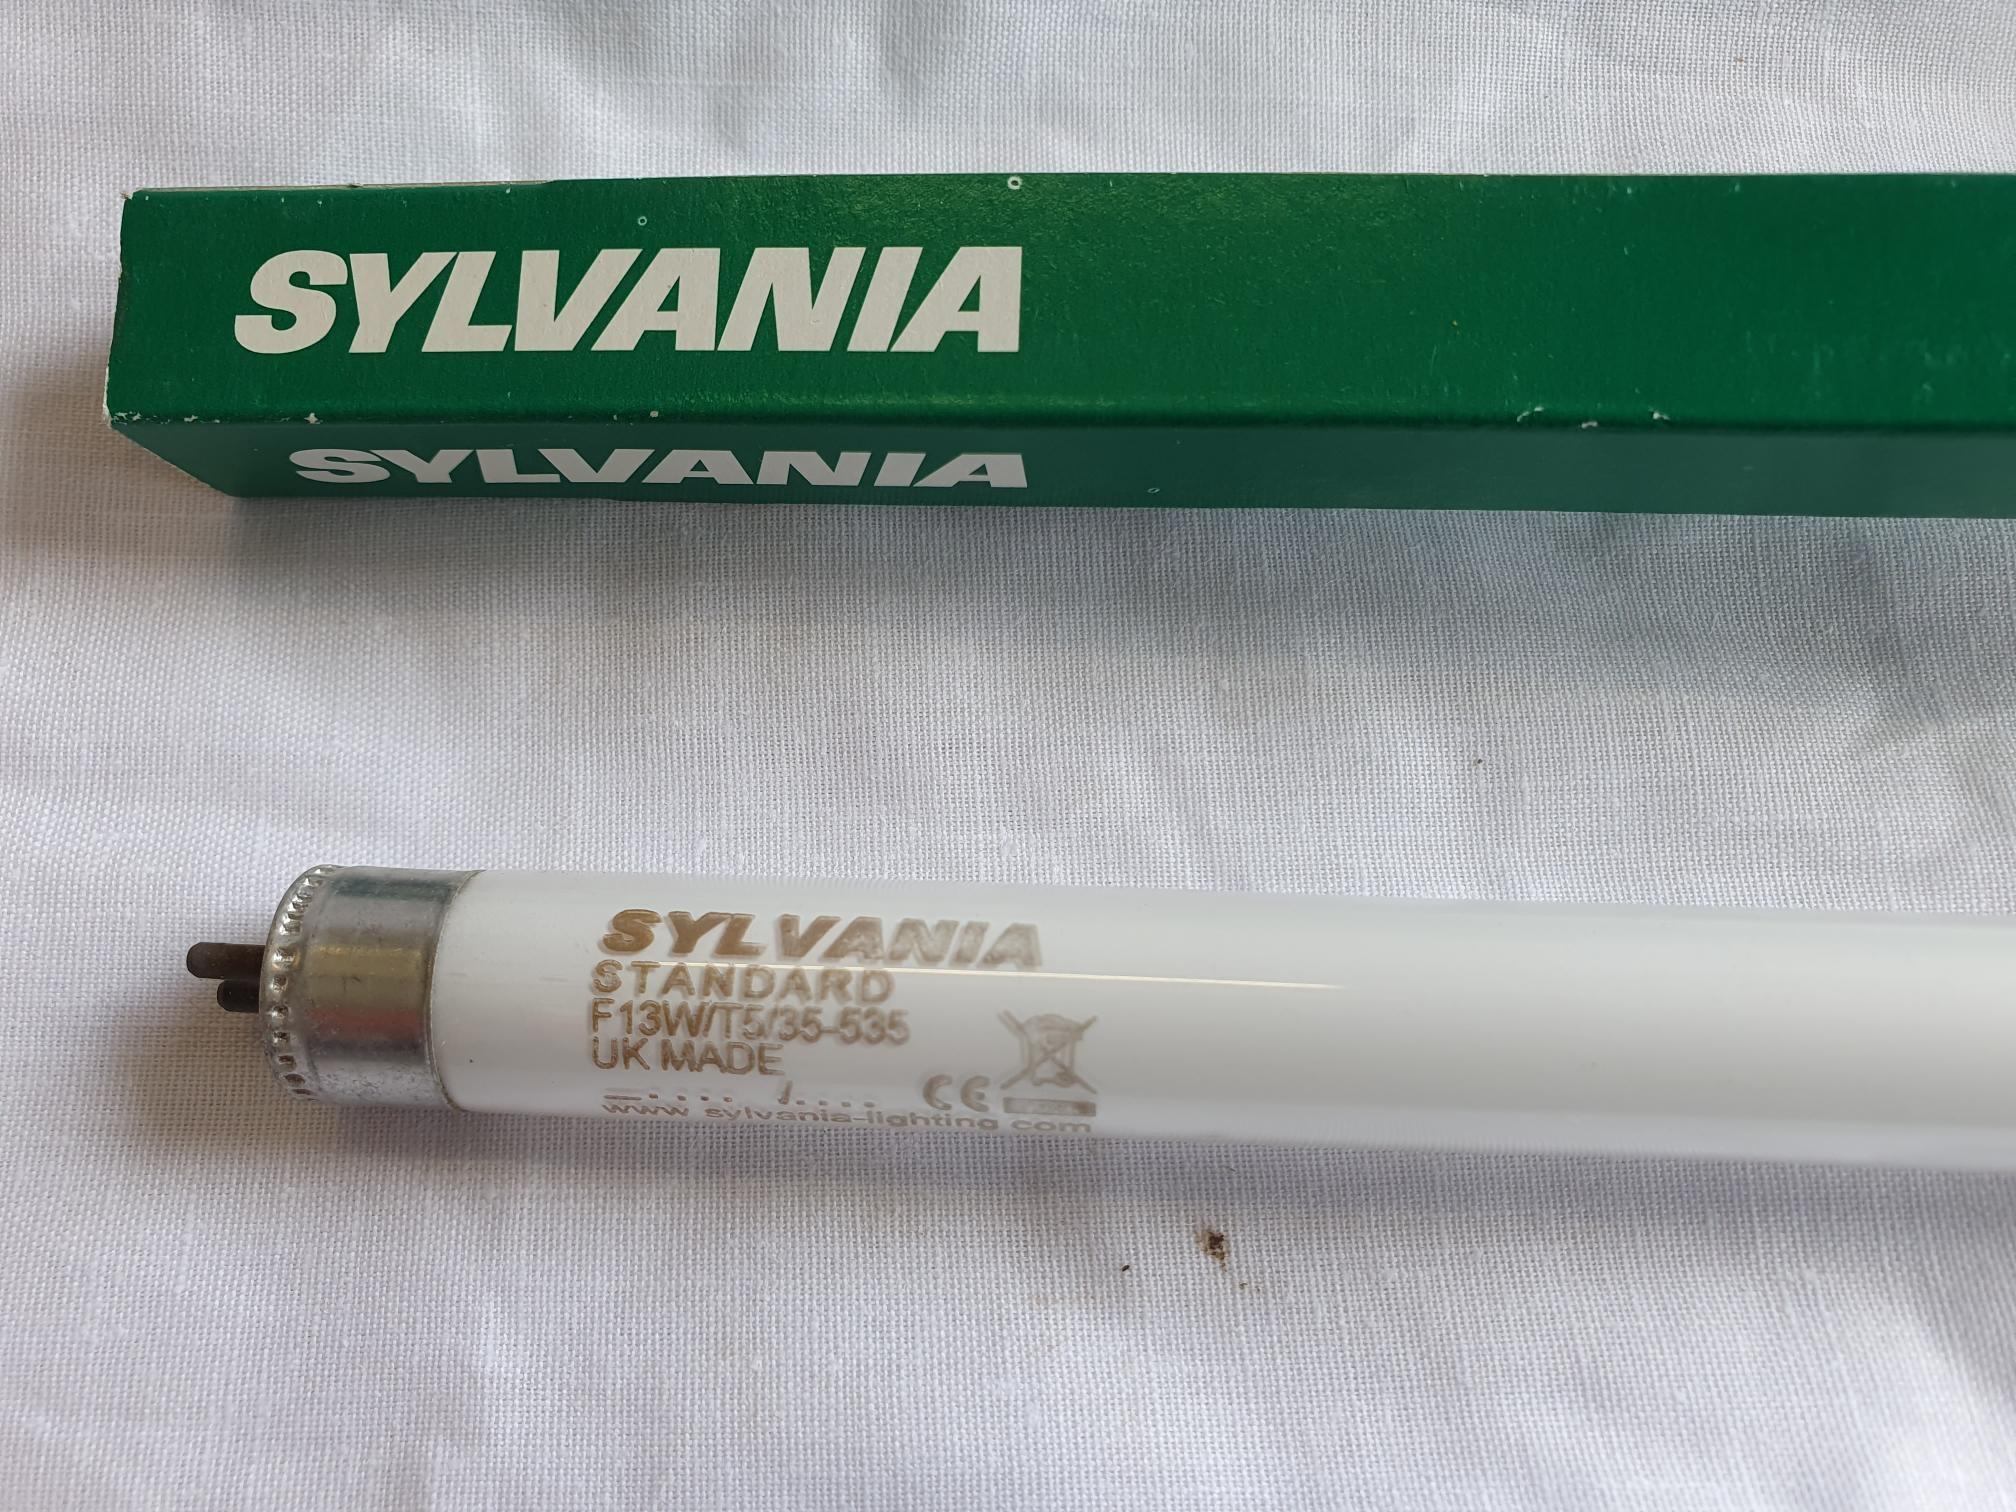 Sylvania Flourescent Tubes F13W W T5 Standard 525 Mm Long